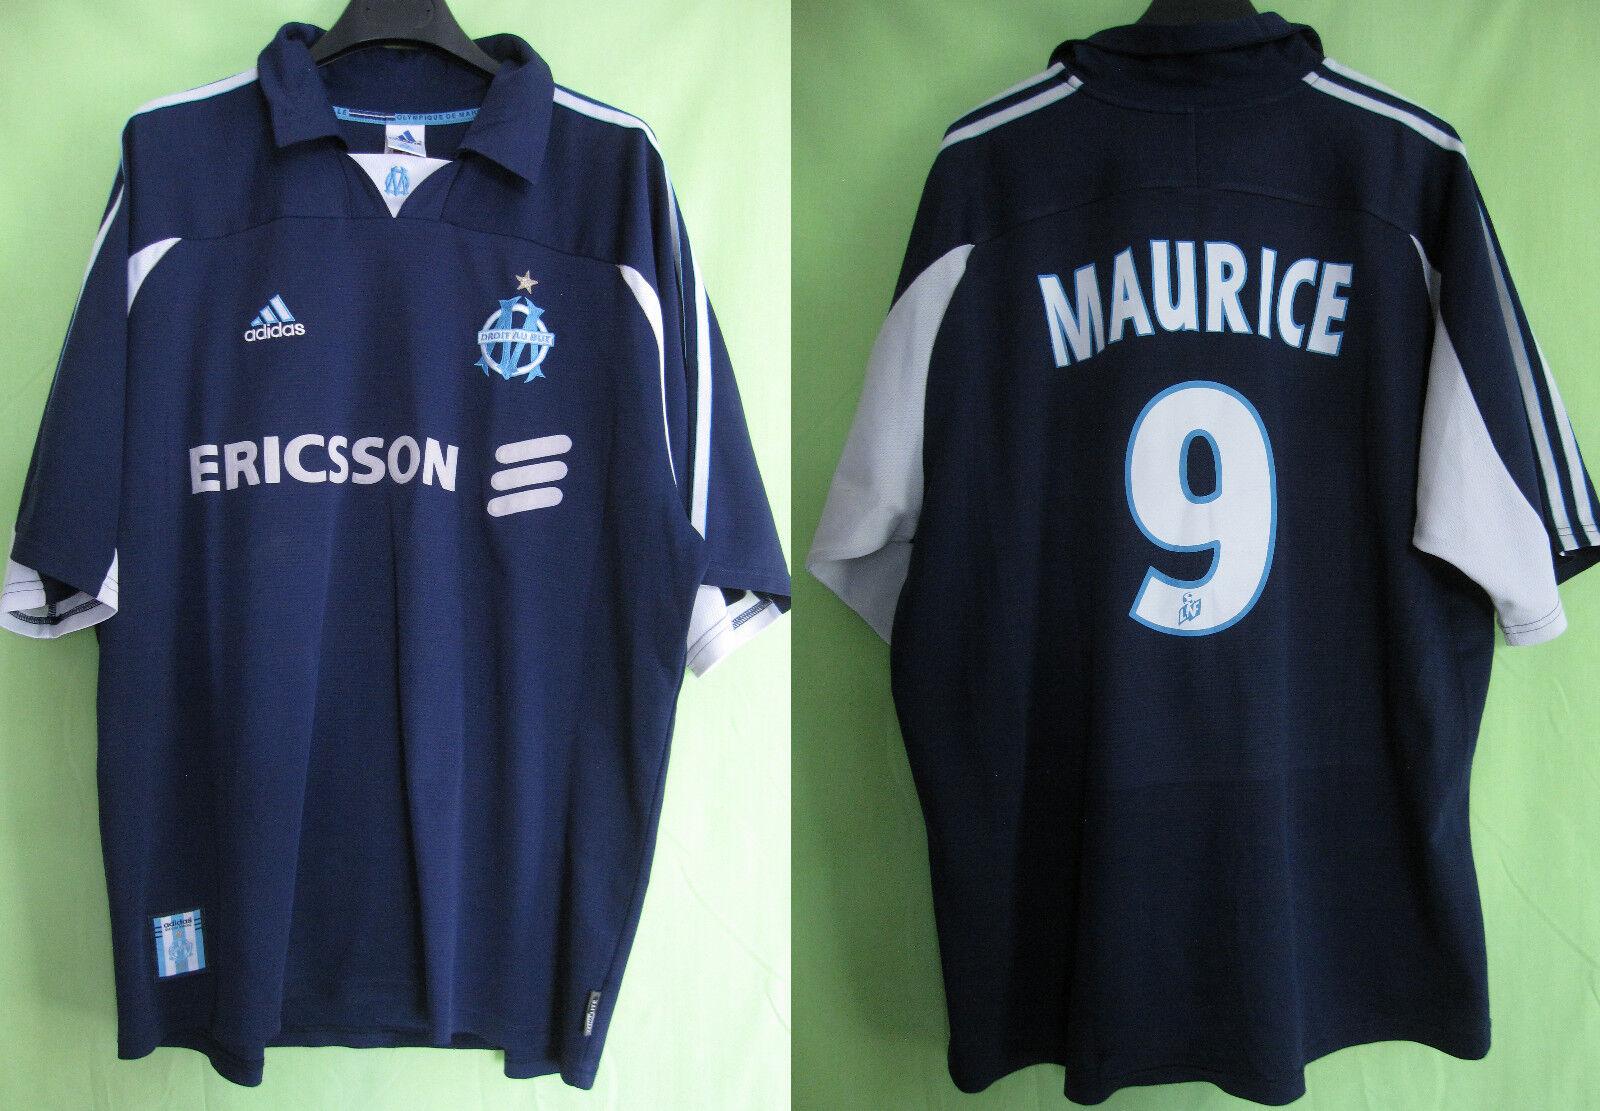 Maillot Olympique Marseille 2000 shirt MAURICE Ericsson OM Football - XL